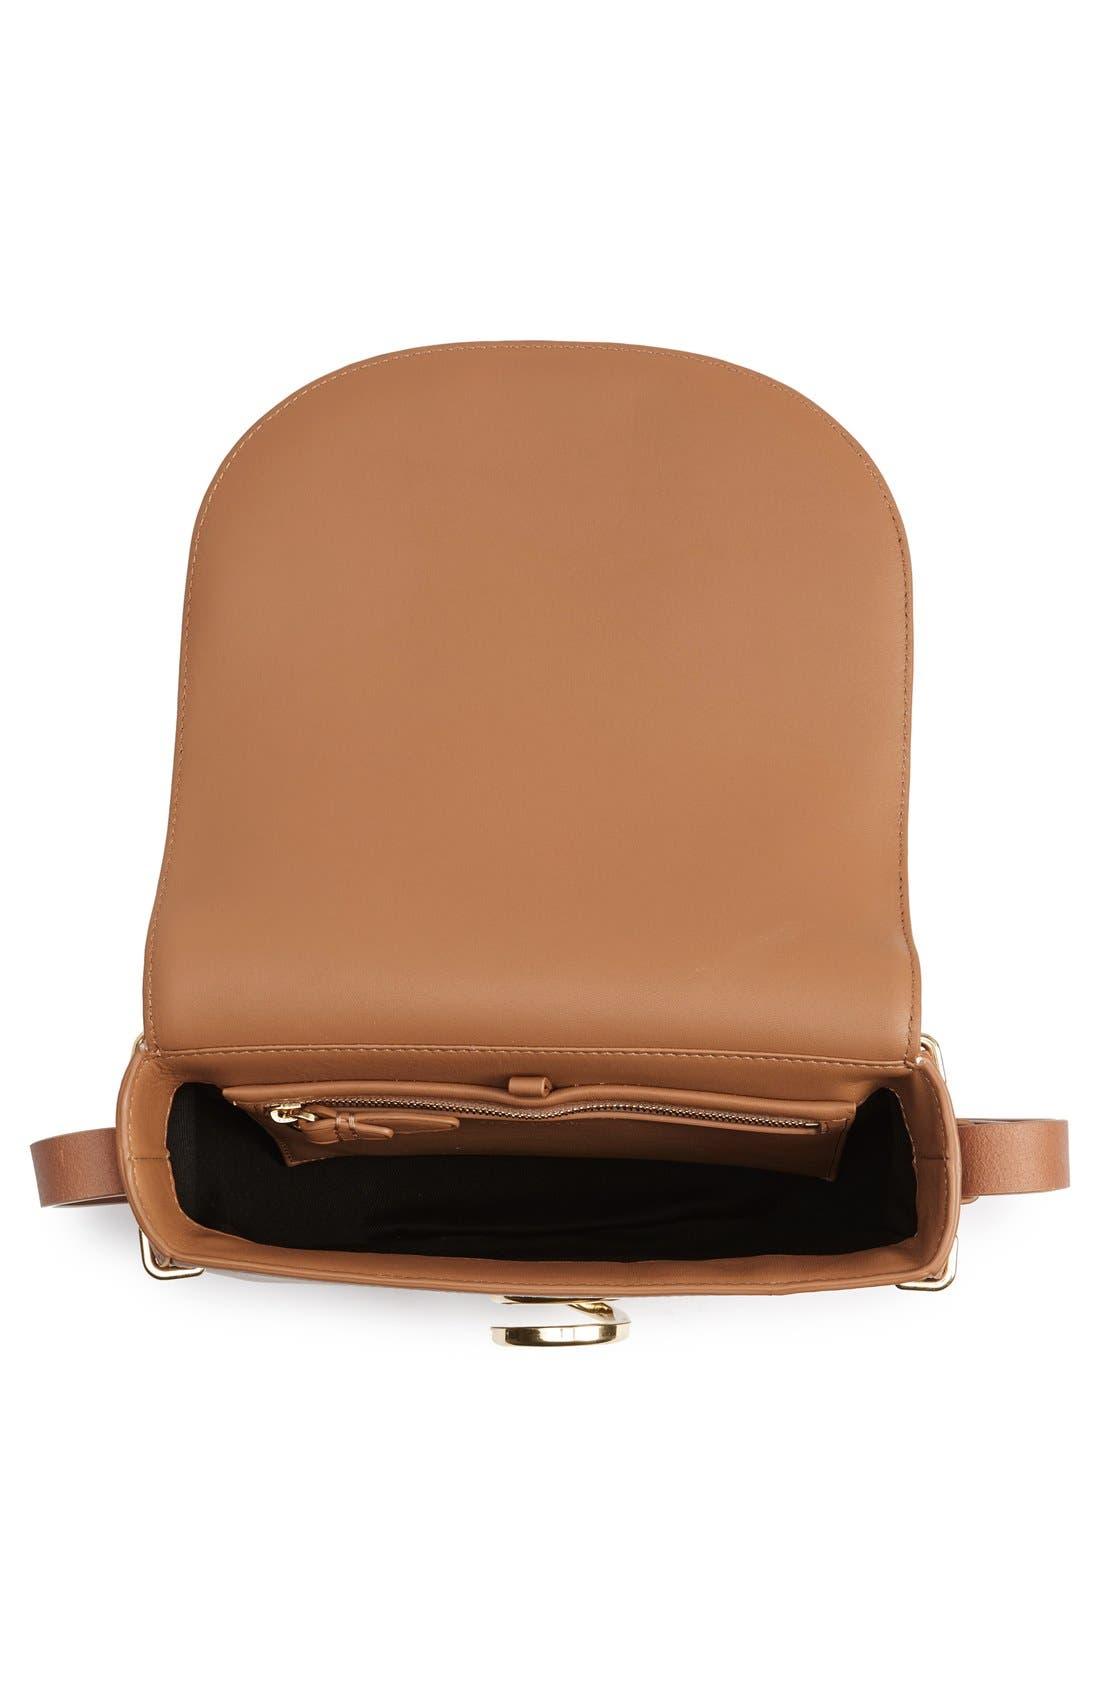 Alix Leather Saddle Bag,                             Alternate thumbnail 4, color,                             Camel